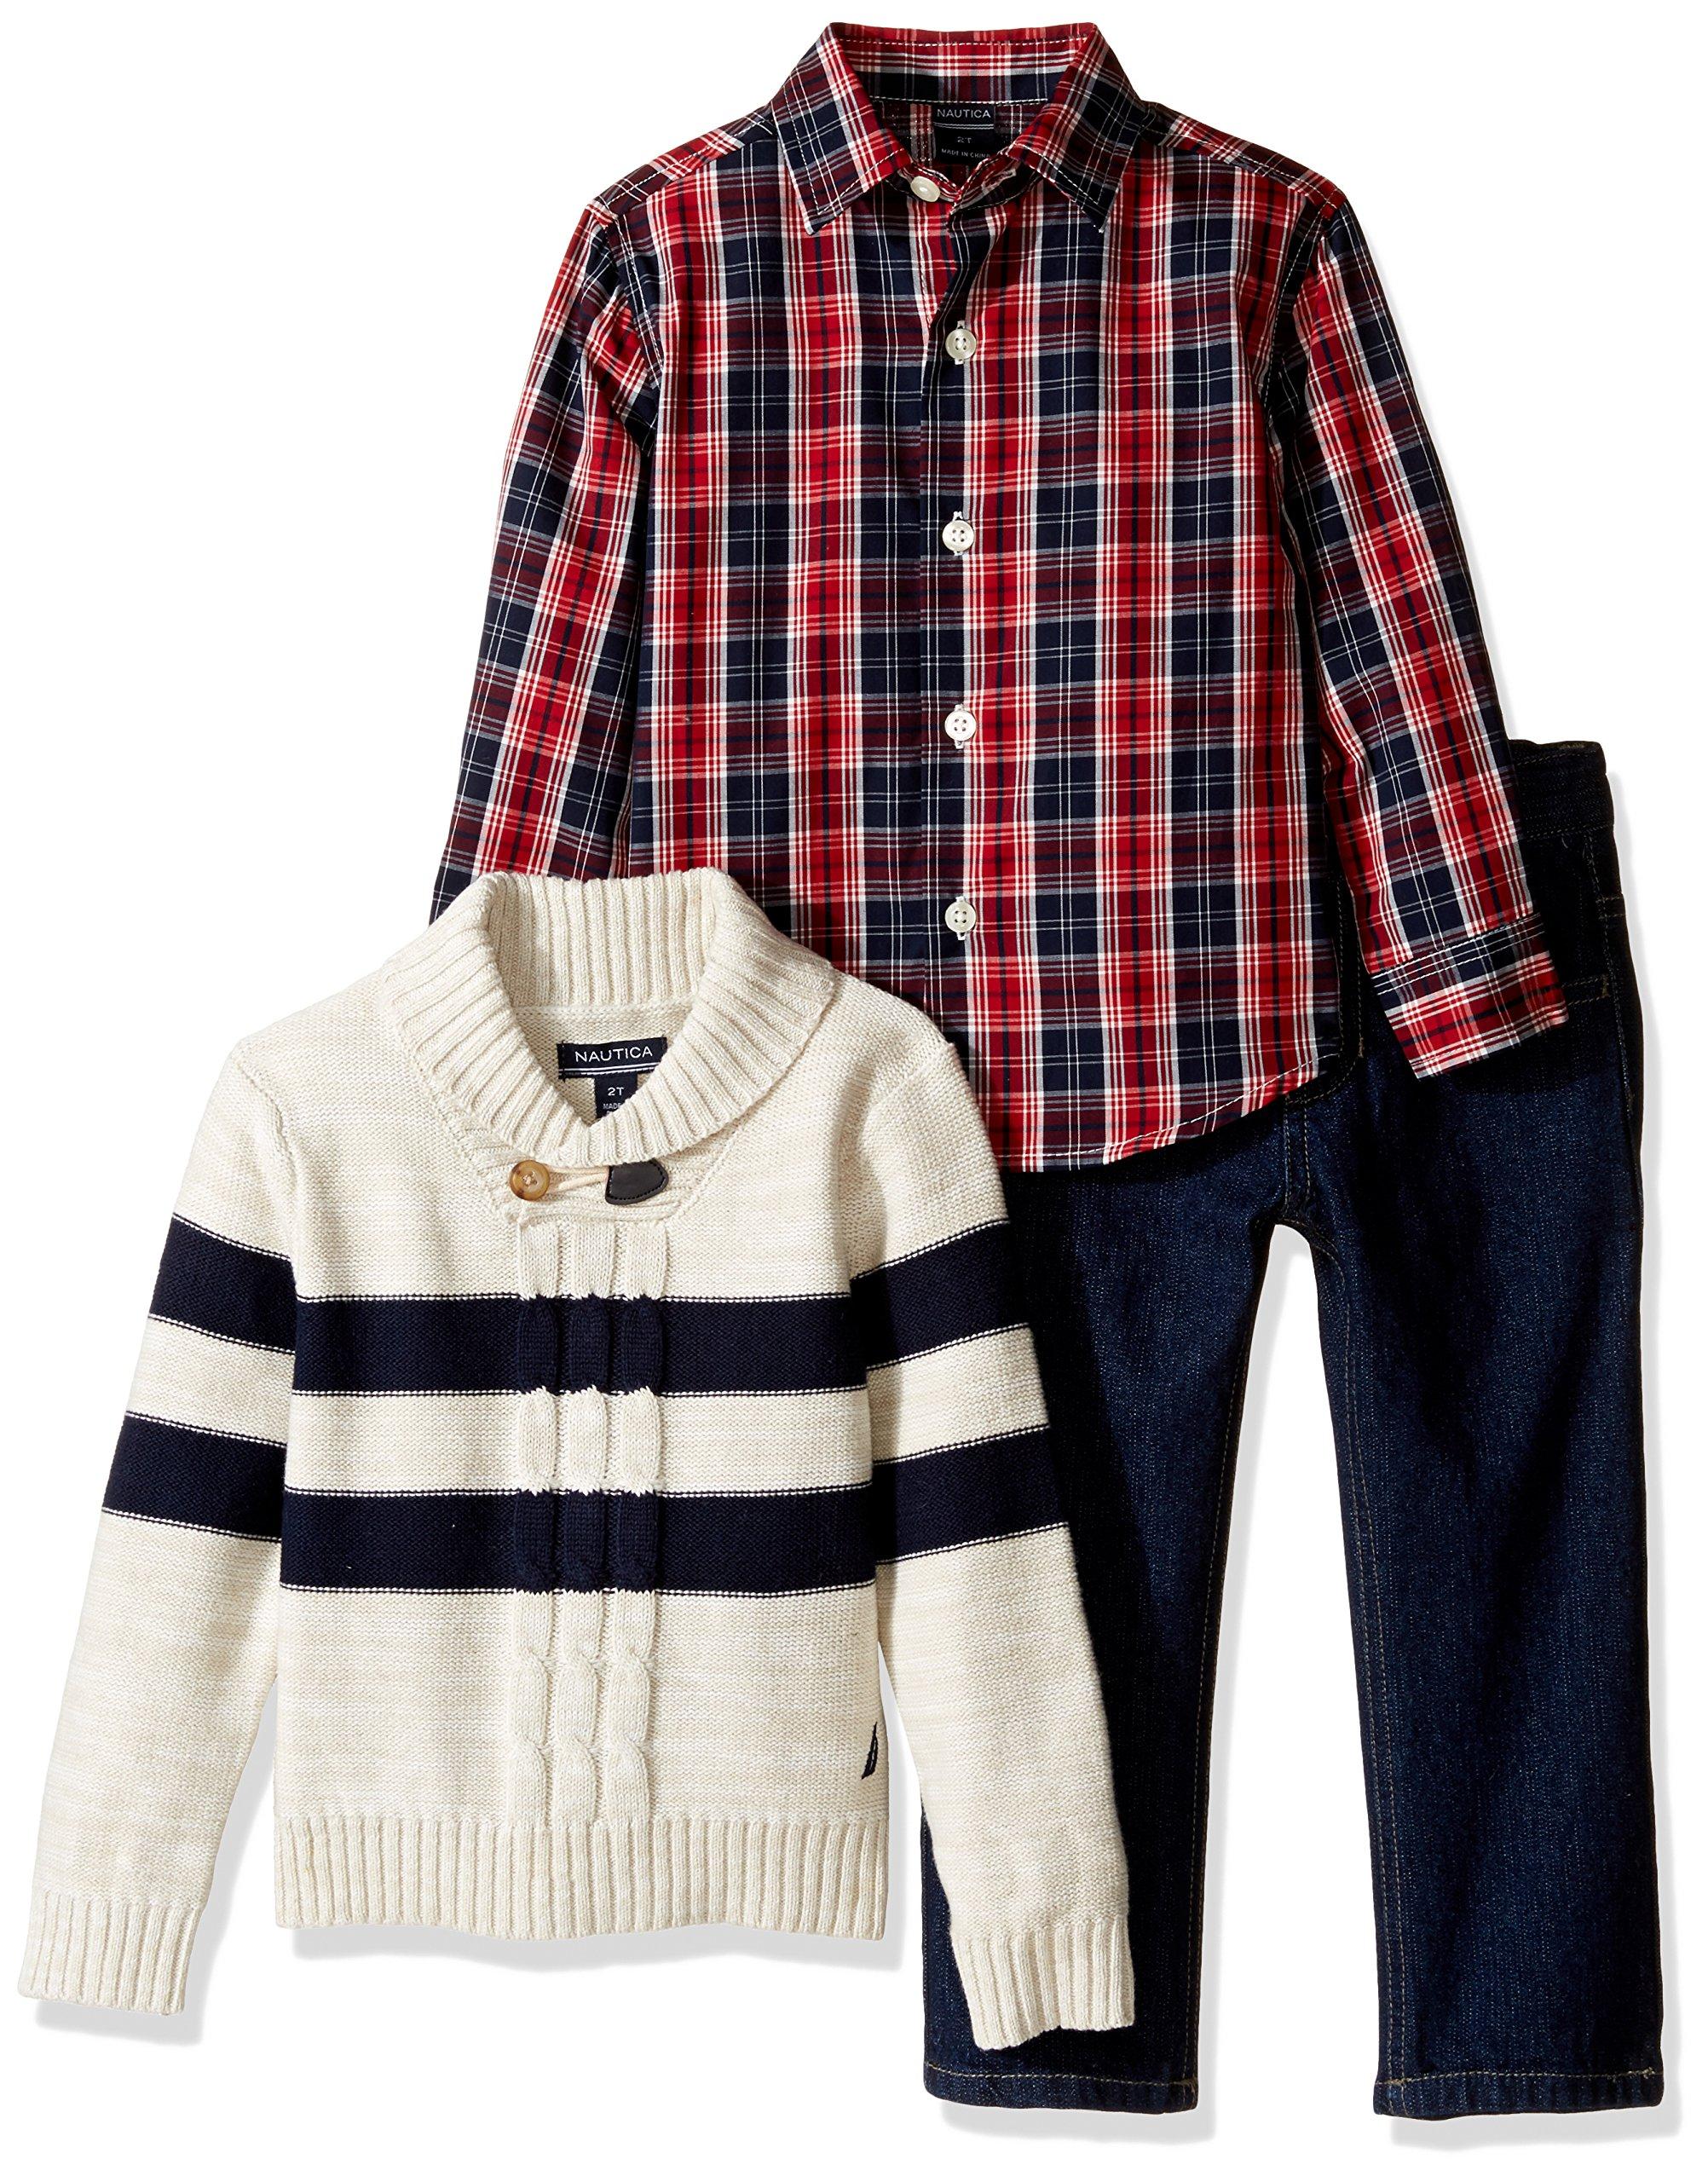 Quarter Zip Sweater and Denim Jean Nautica Three Piece Set with Woven Shirt